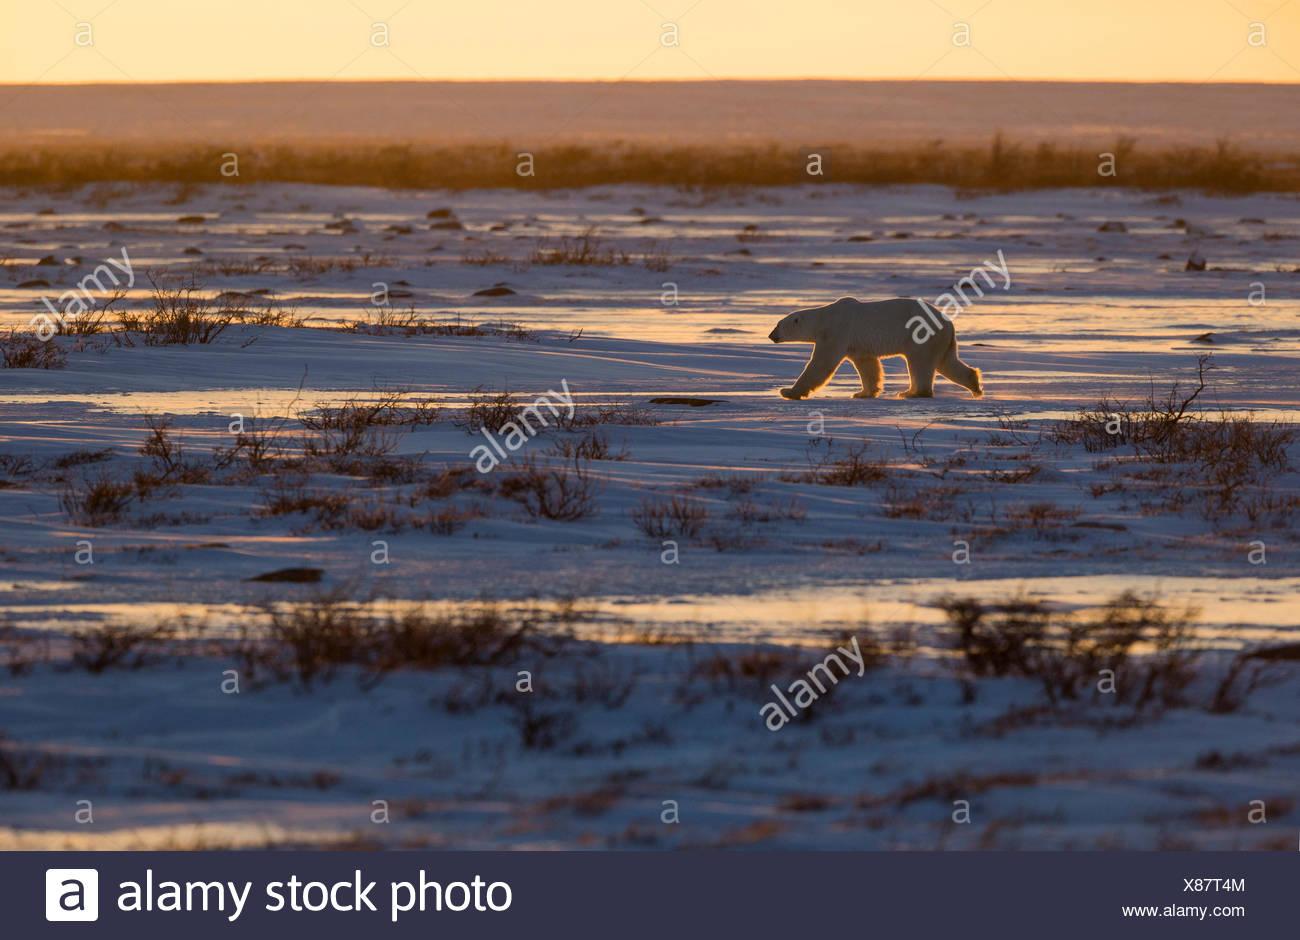 Polar bear (Ursus maritimus), walking over tundra at sunset, Cape Churchill, Wapusk National Park, Manitoba. - Stock Image